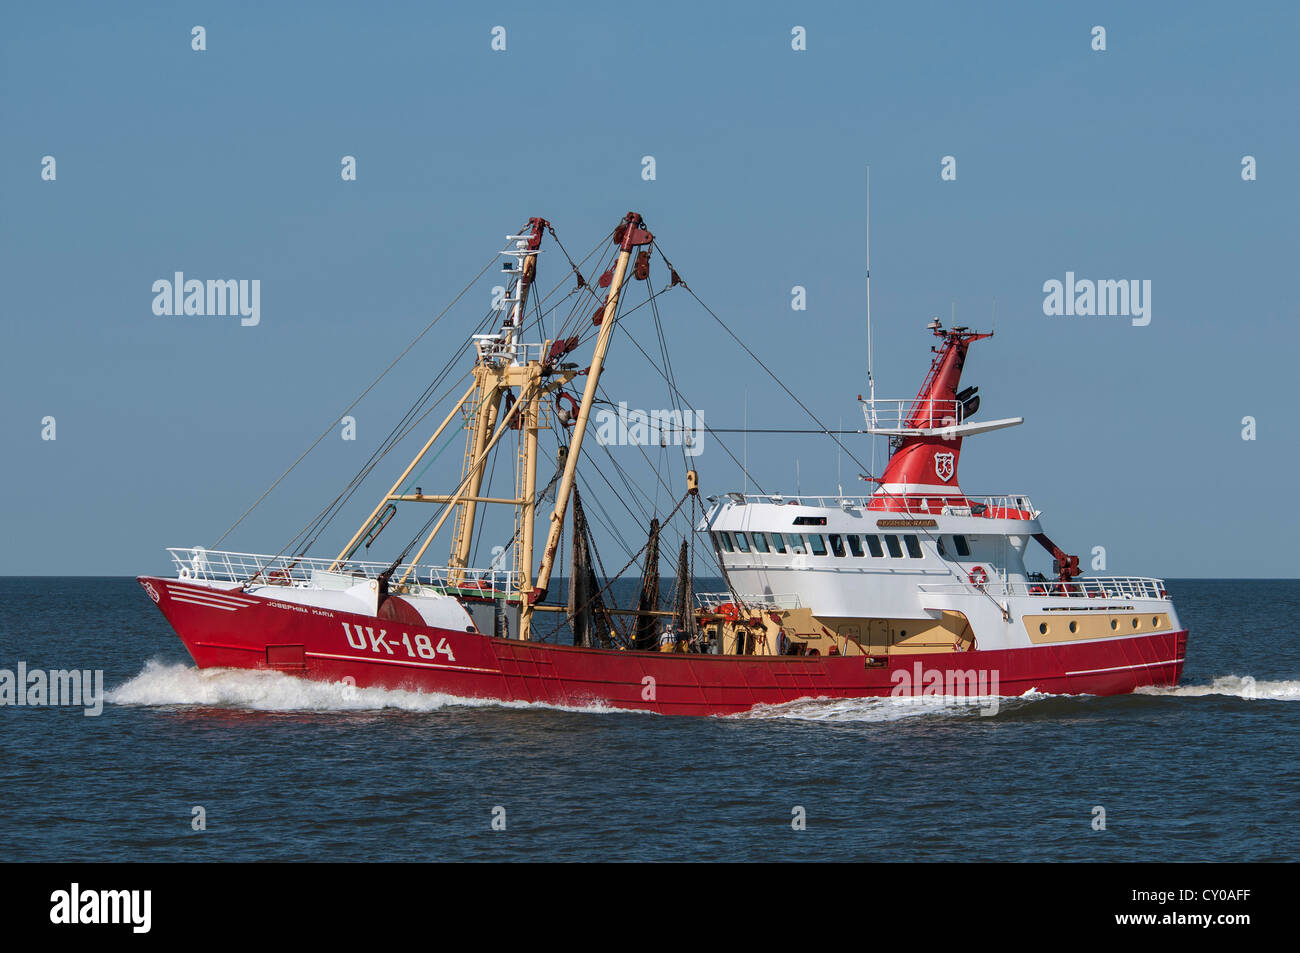 Side trawler Josephina Maria UK-184, North Sea, dragnet trawler - Stock Image